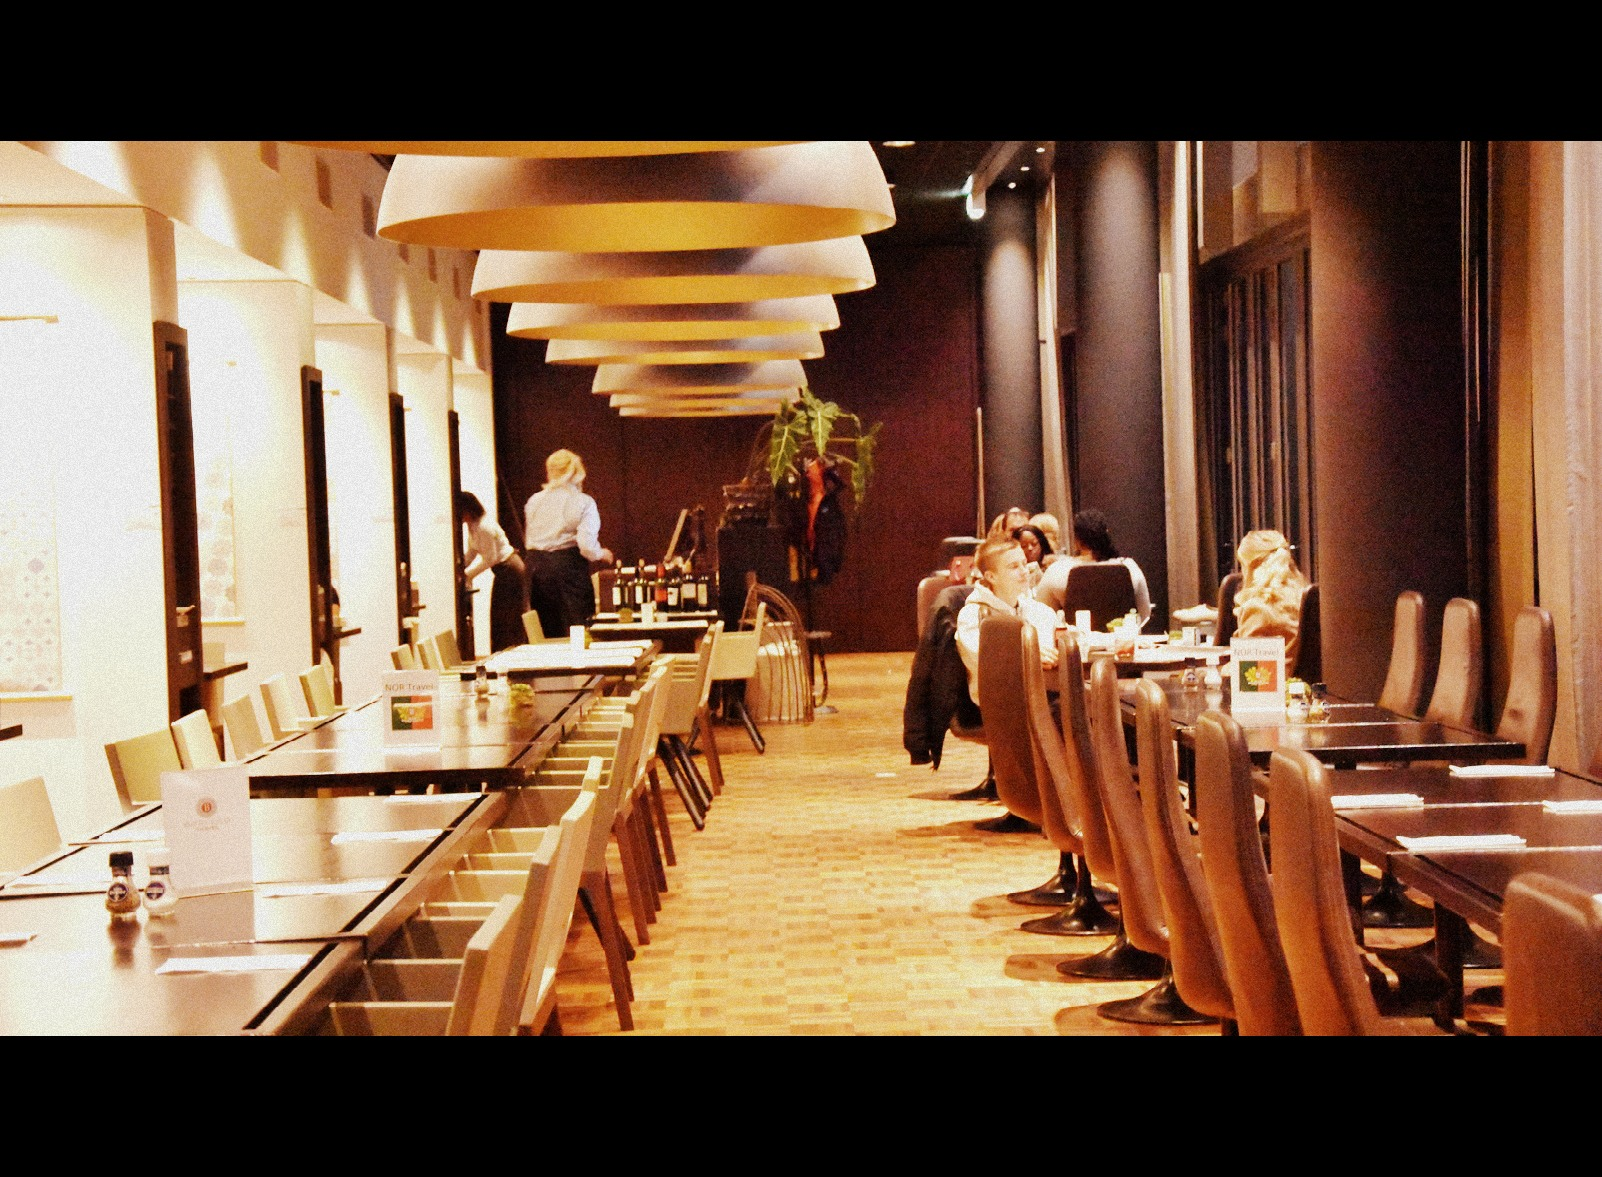 diner Dutch design hotel artimes, high tea vriendinnen